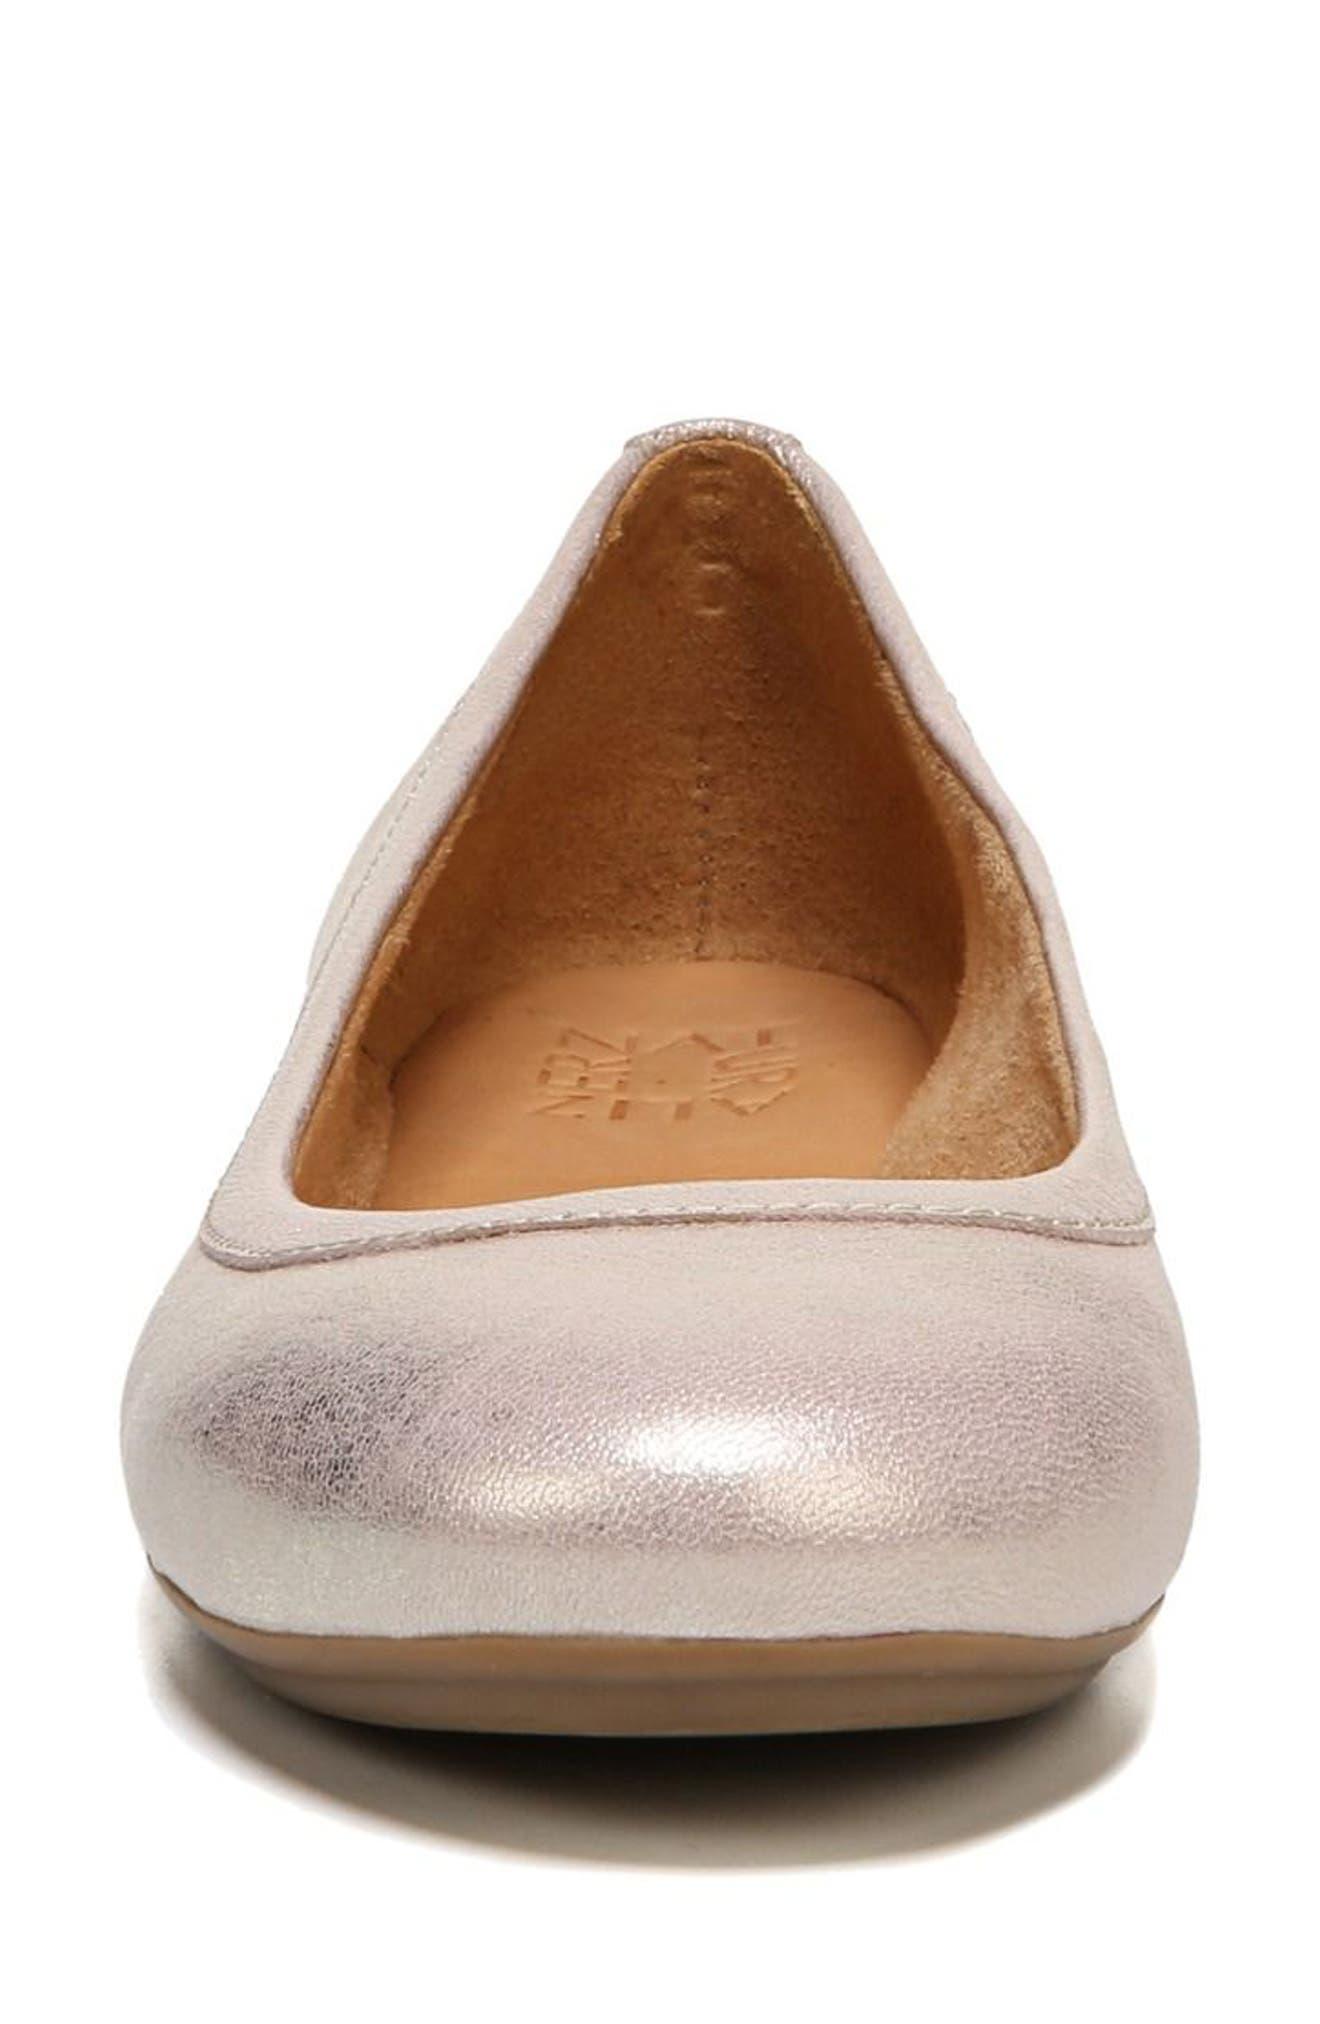 Brittany Ballet Flat,                             Alternate thumbnail 43, color,